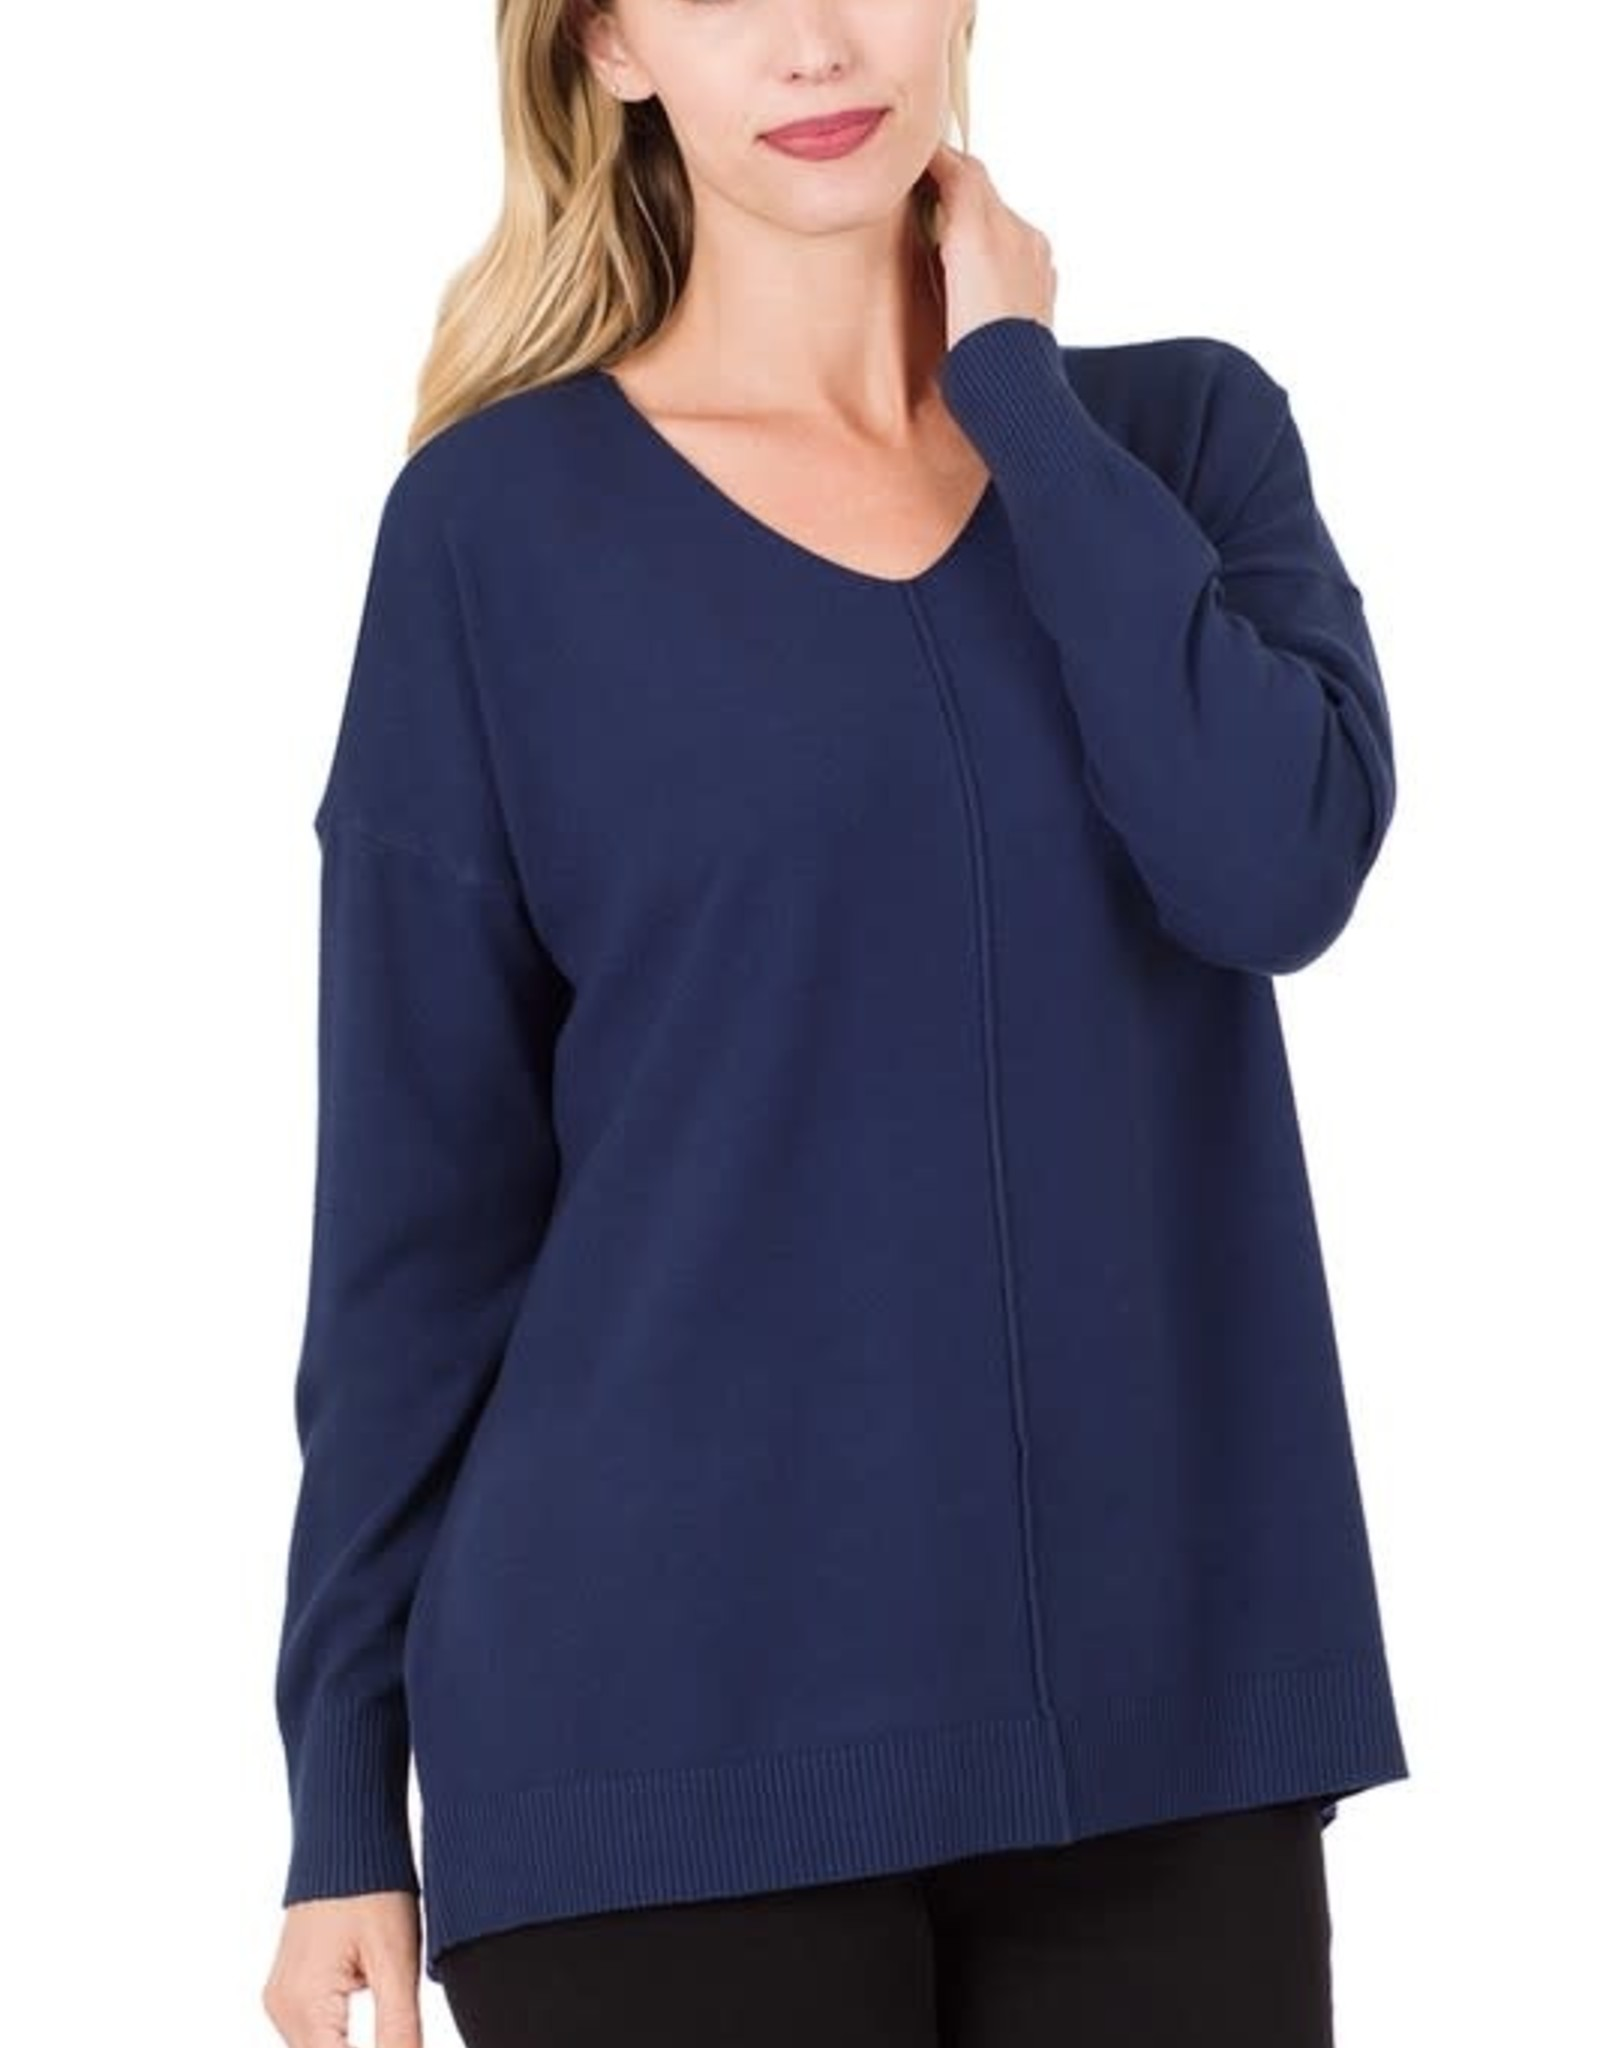 - Navy V-Neck Sweater w/Center Seam